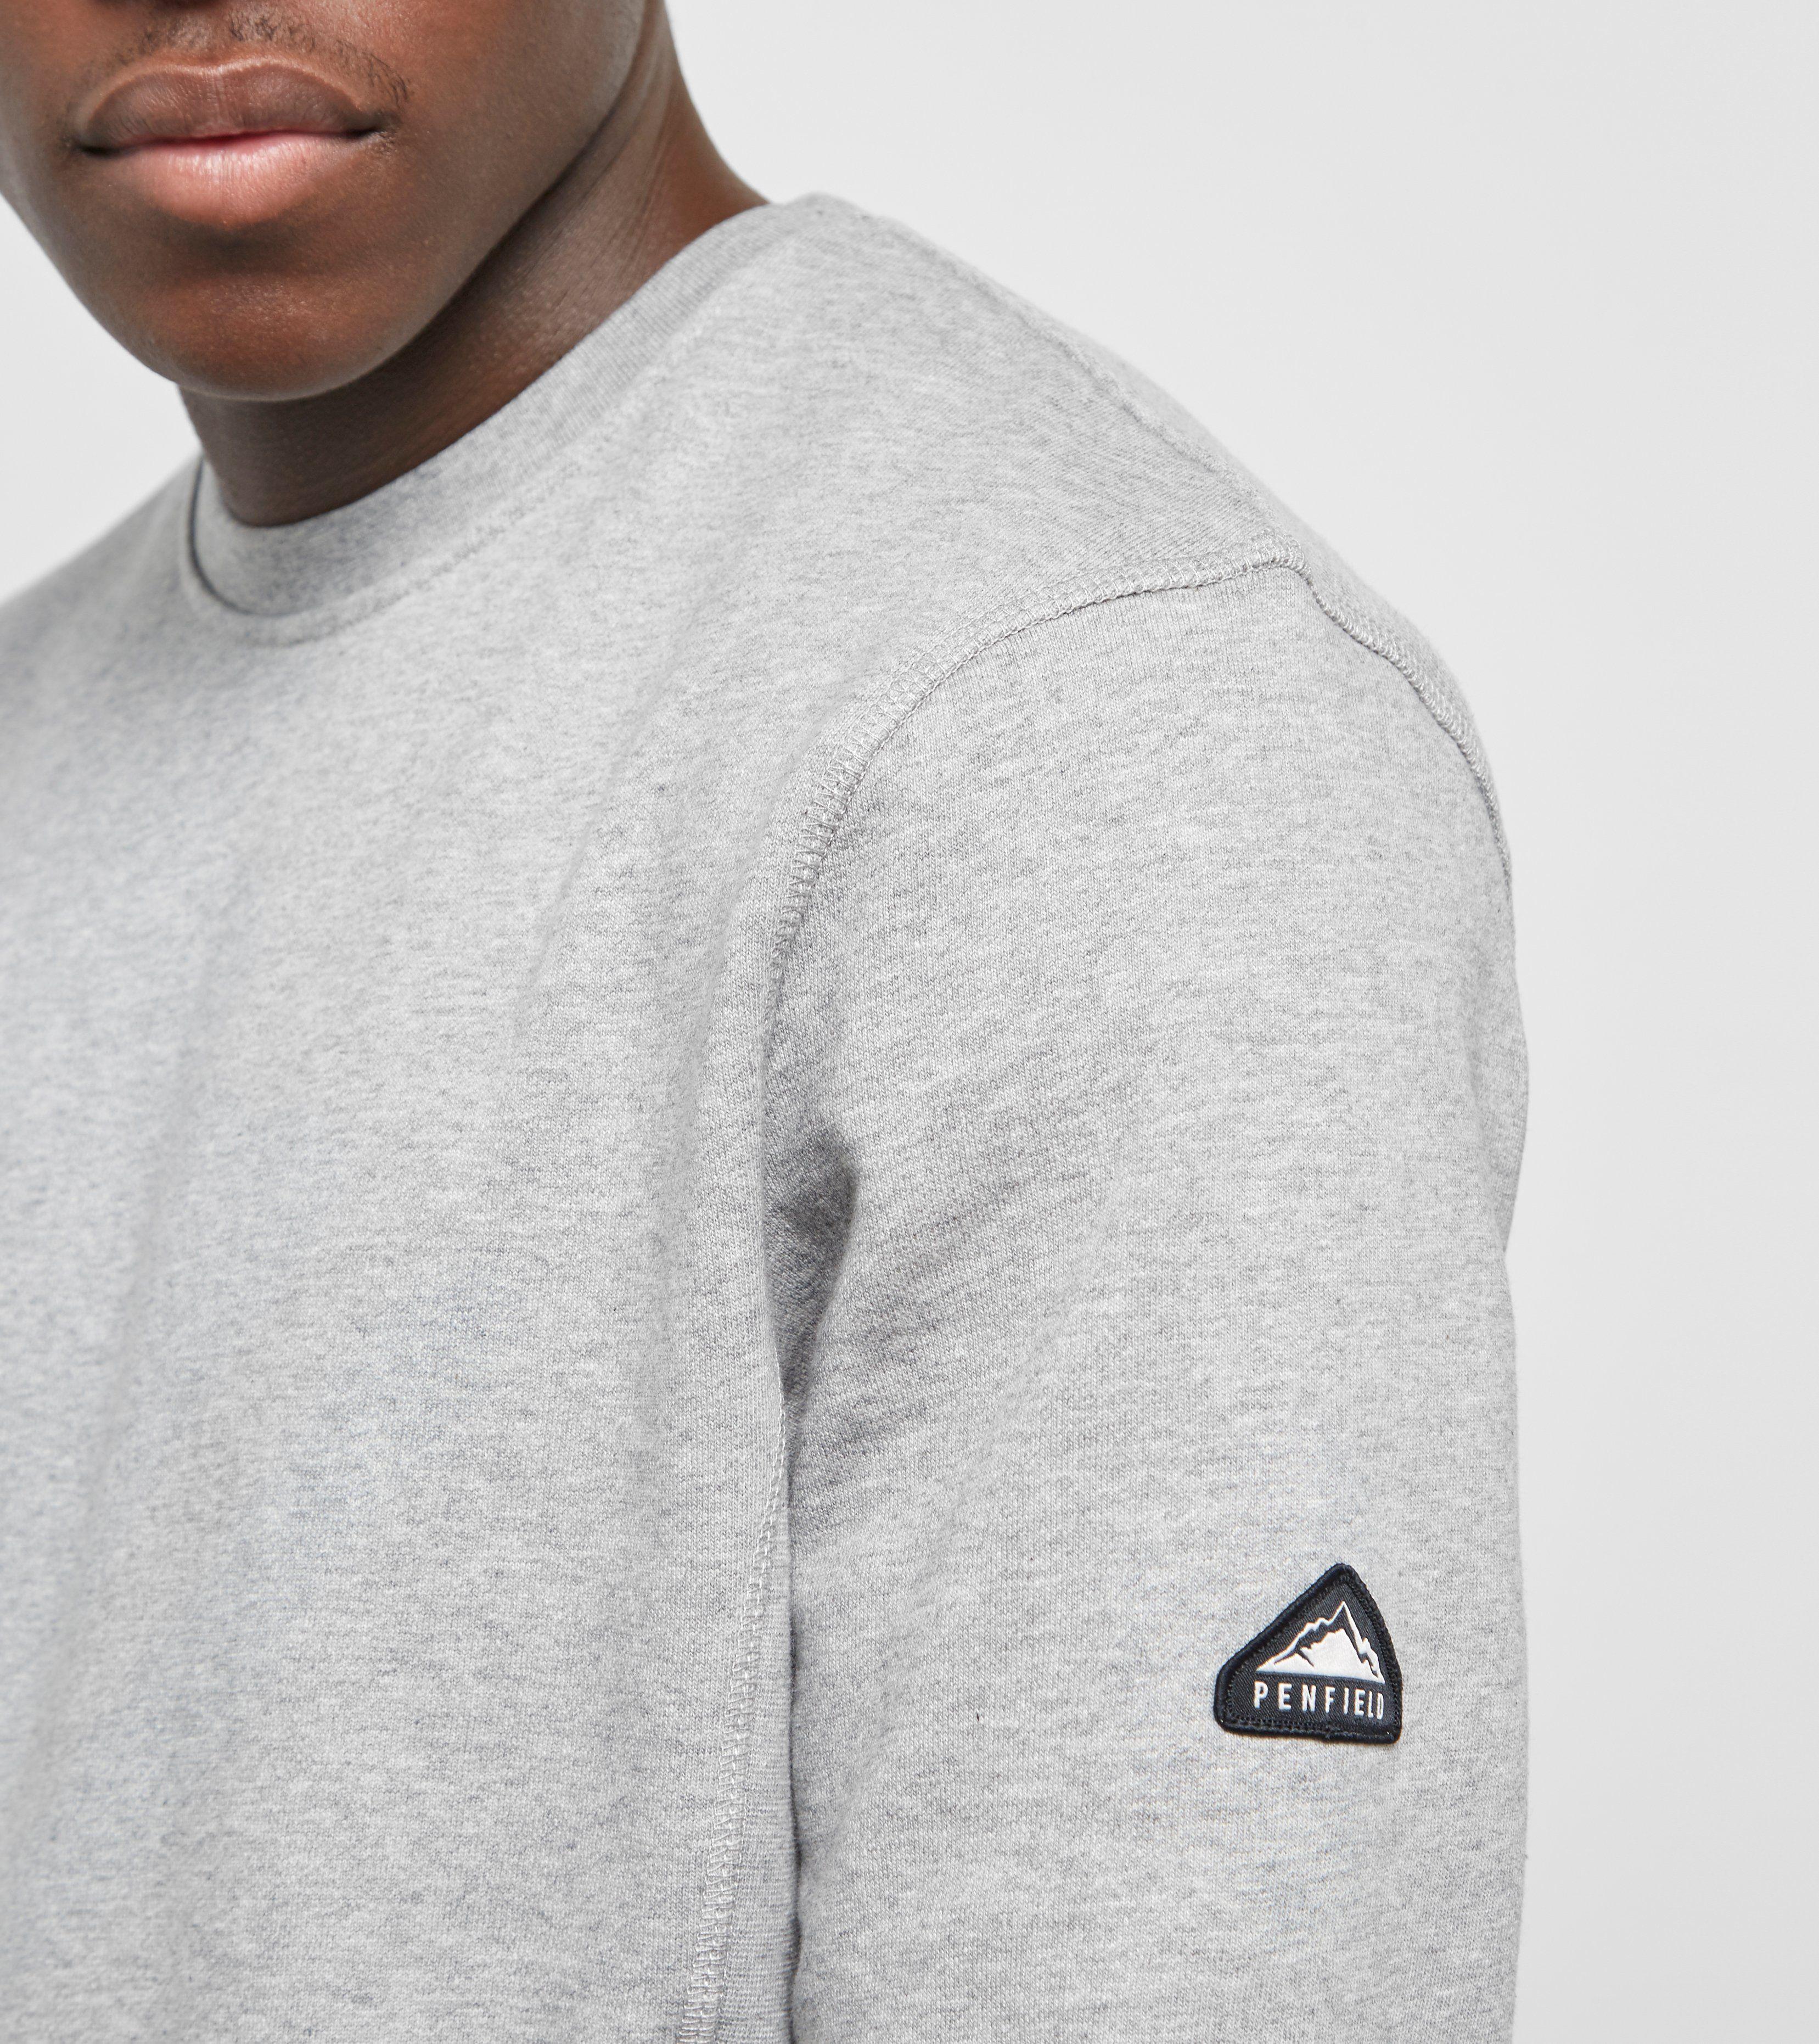 Penfield Eastbay Sweatshirt